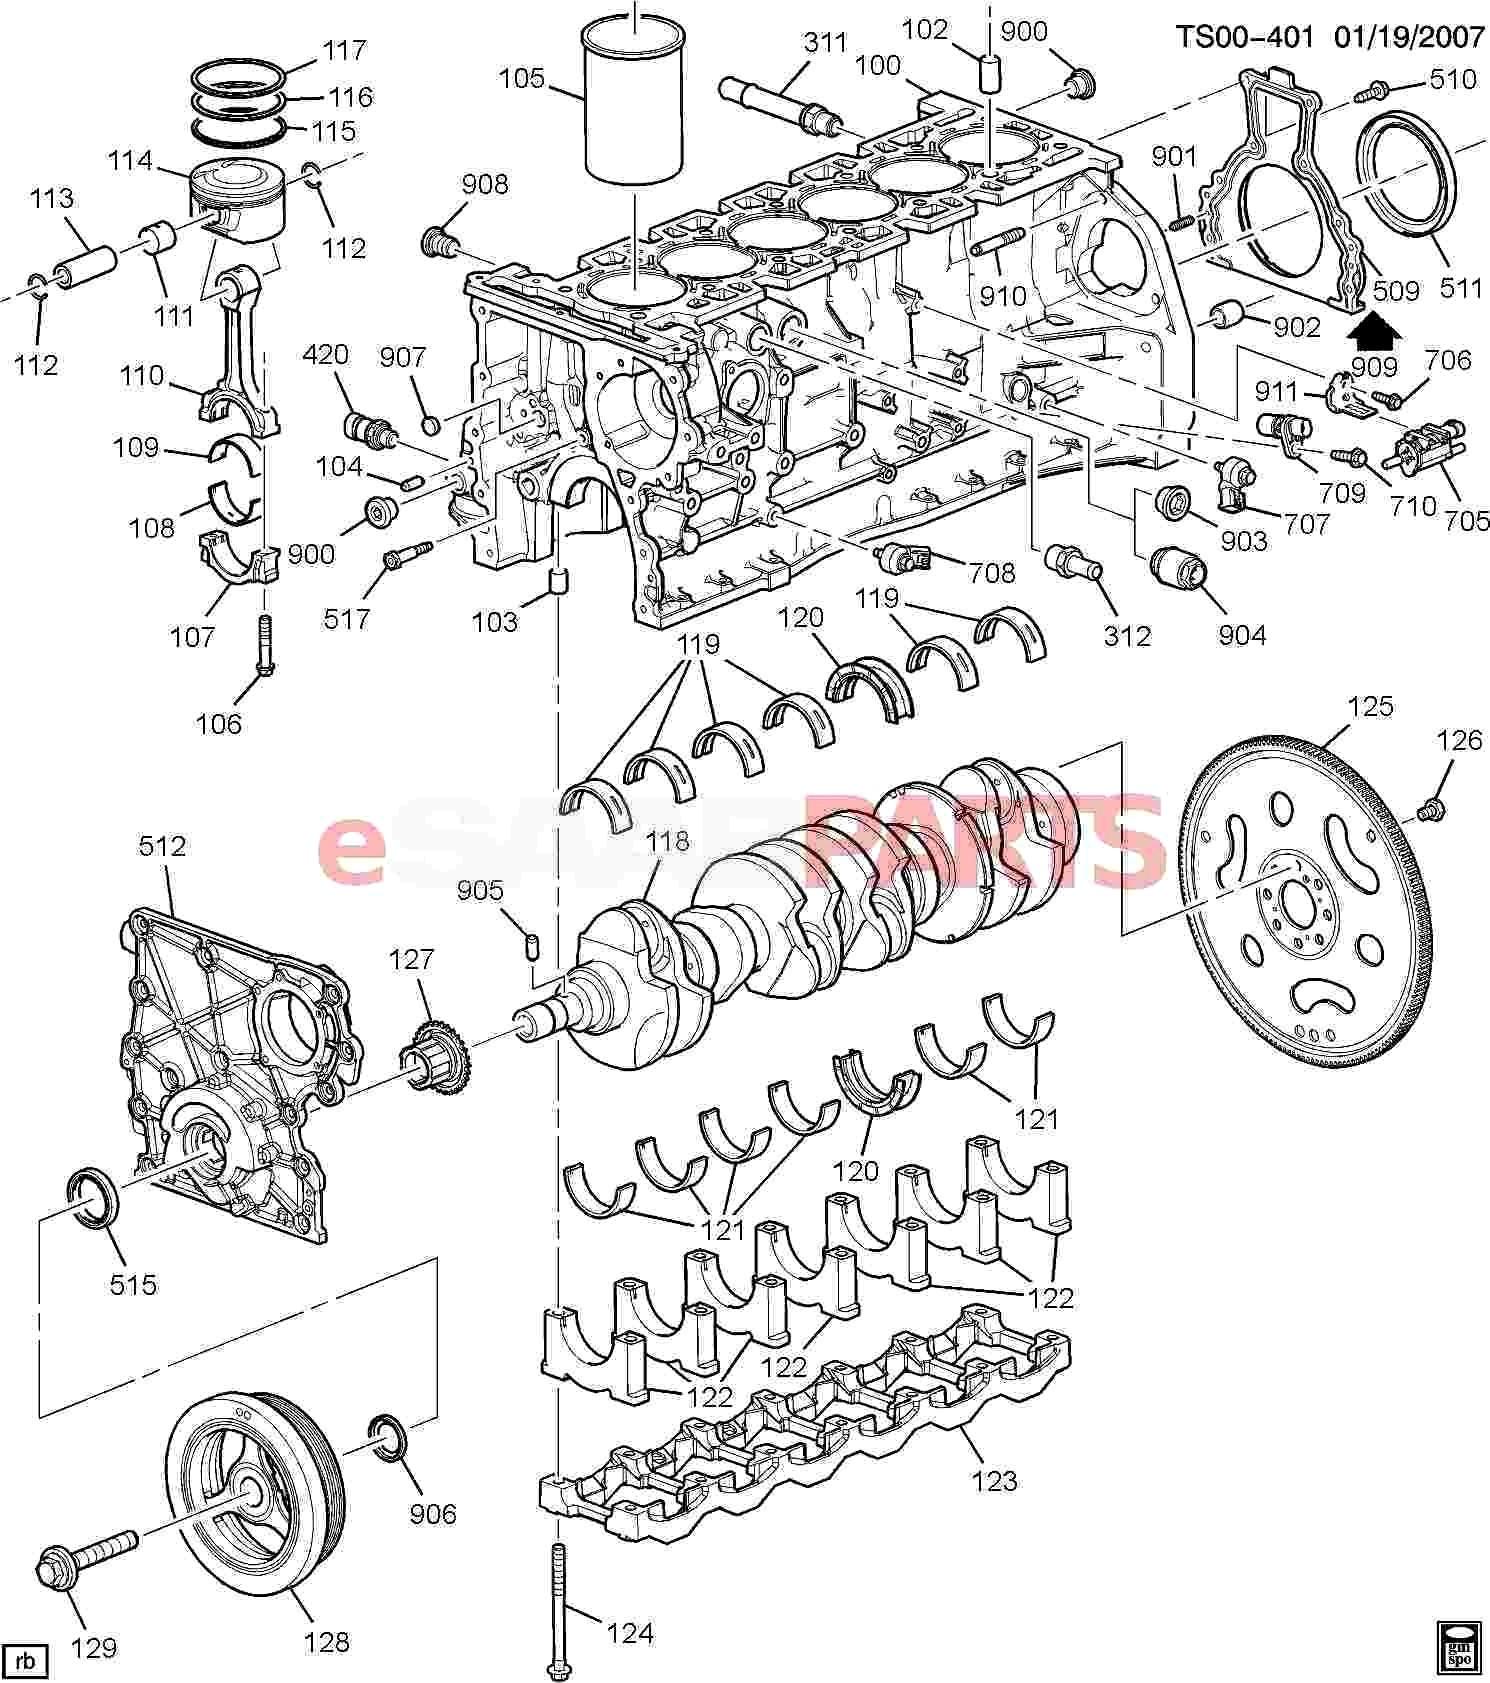 Car Engine Diagram Parts 2018 Chevrolet Performance Parts Catalog Beautiful Chevy Van Parts Of Car Engine Diagram Parts